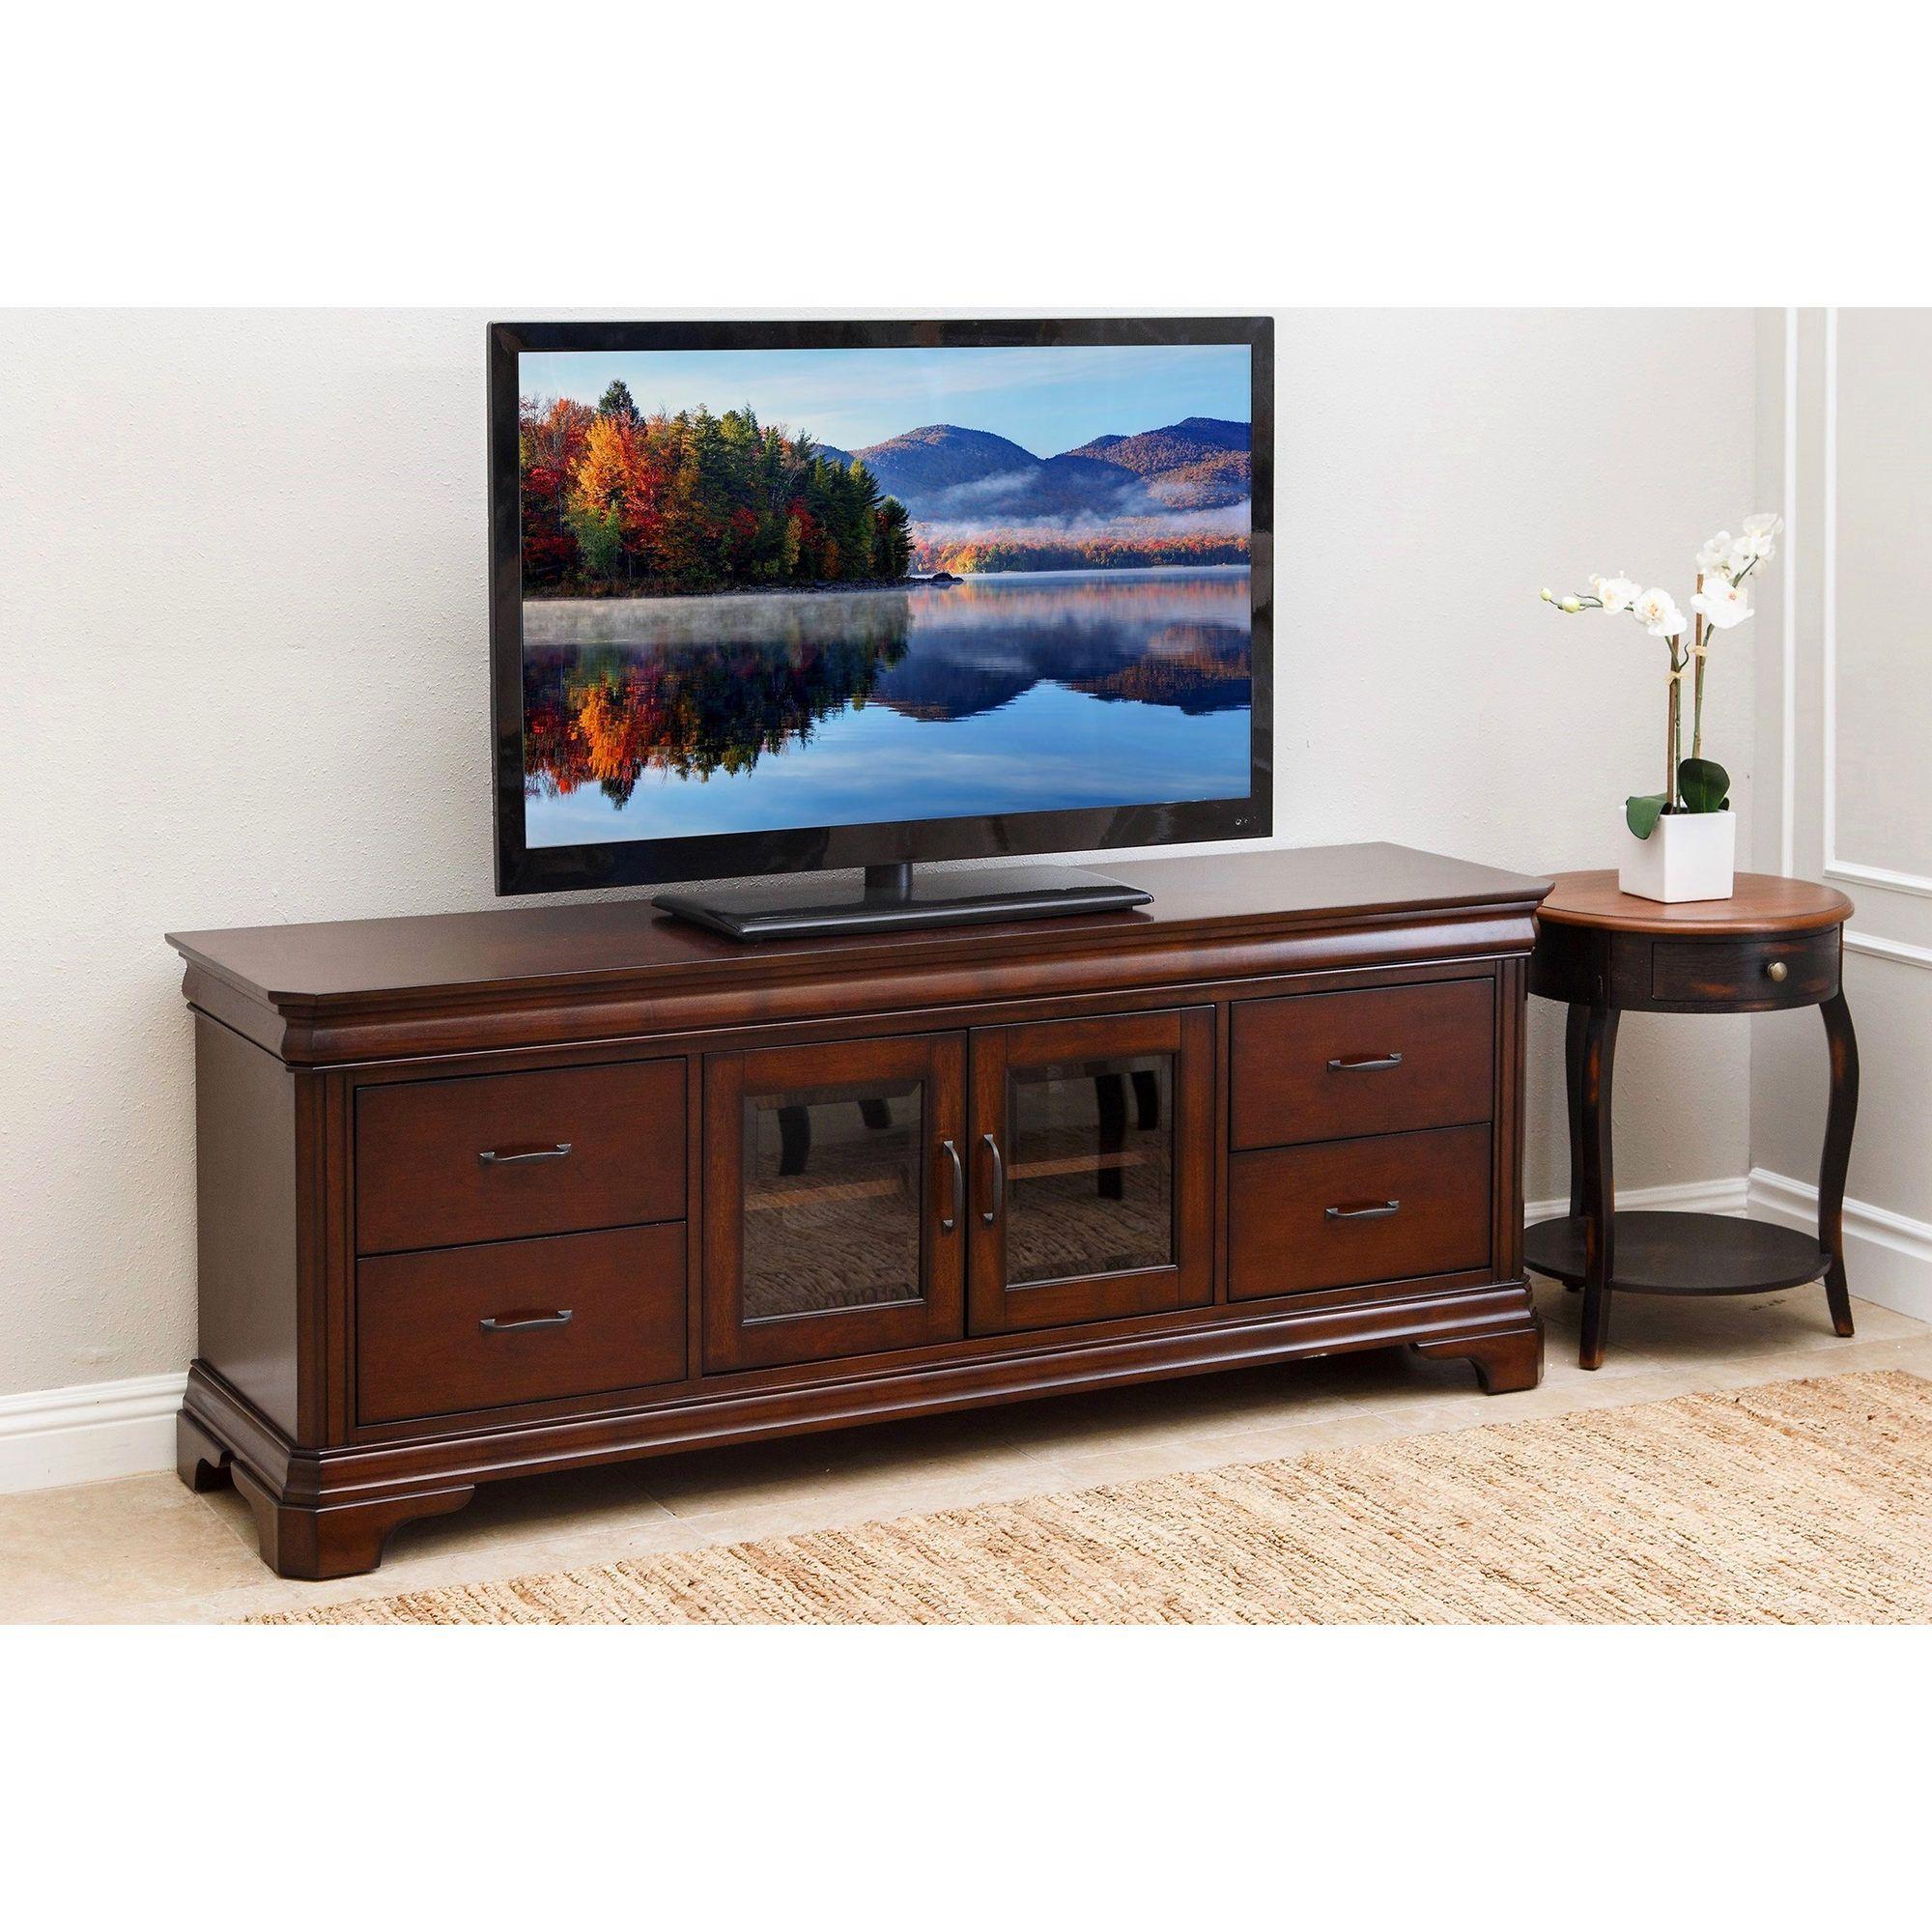 Abbyson Living Wildwood 72 Wood Tv Console Cherry Furniture